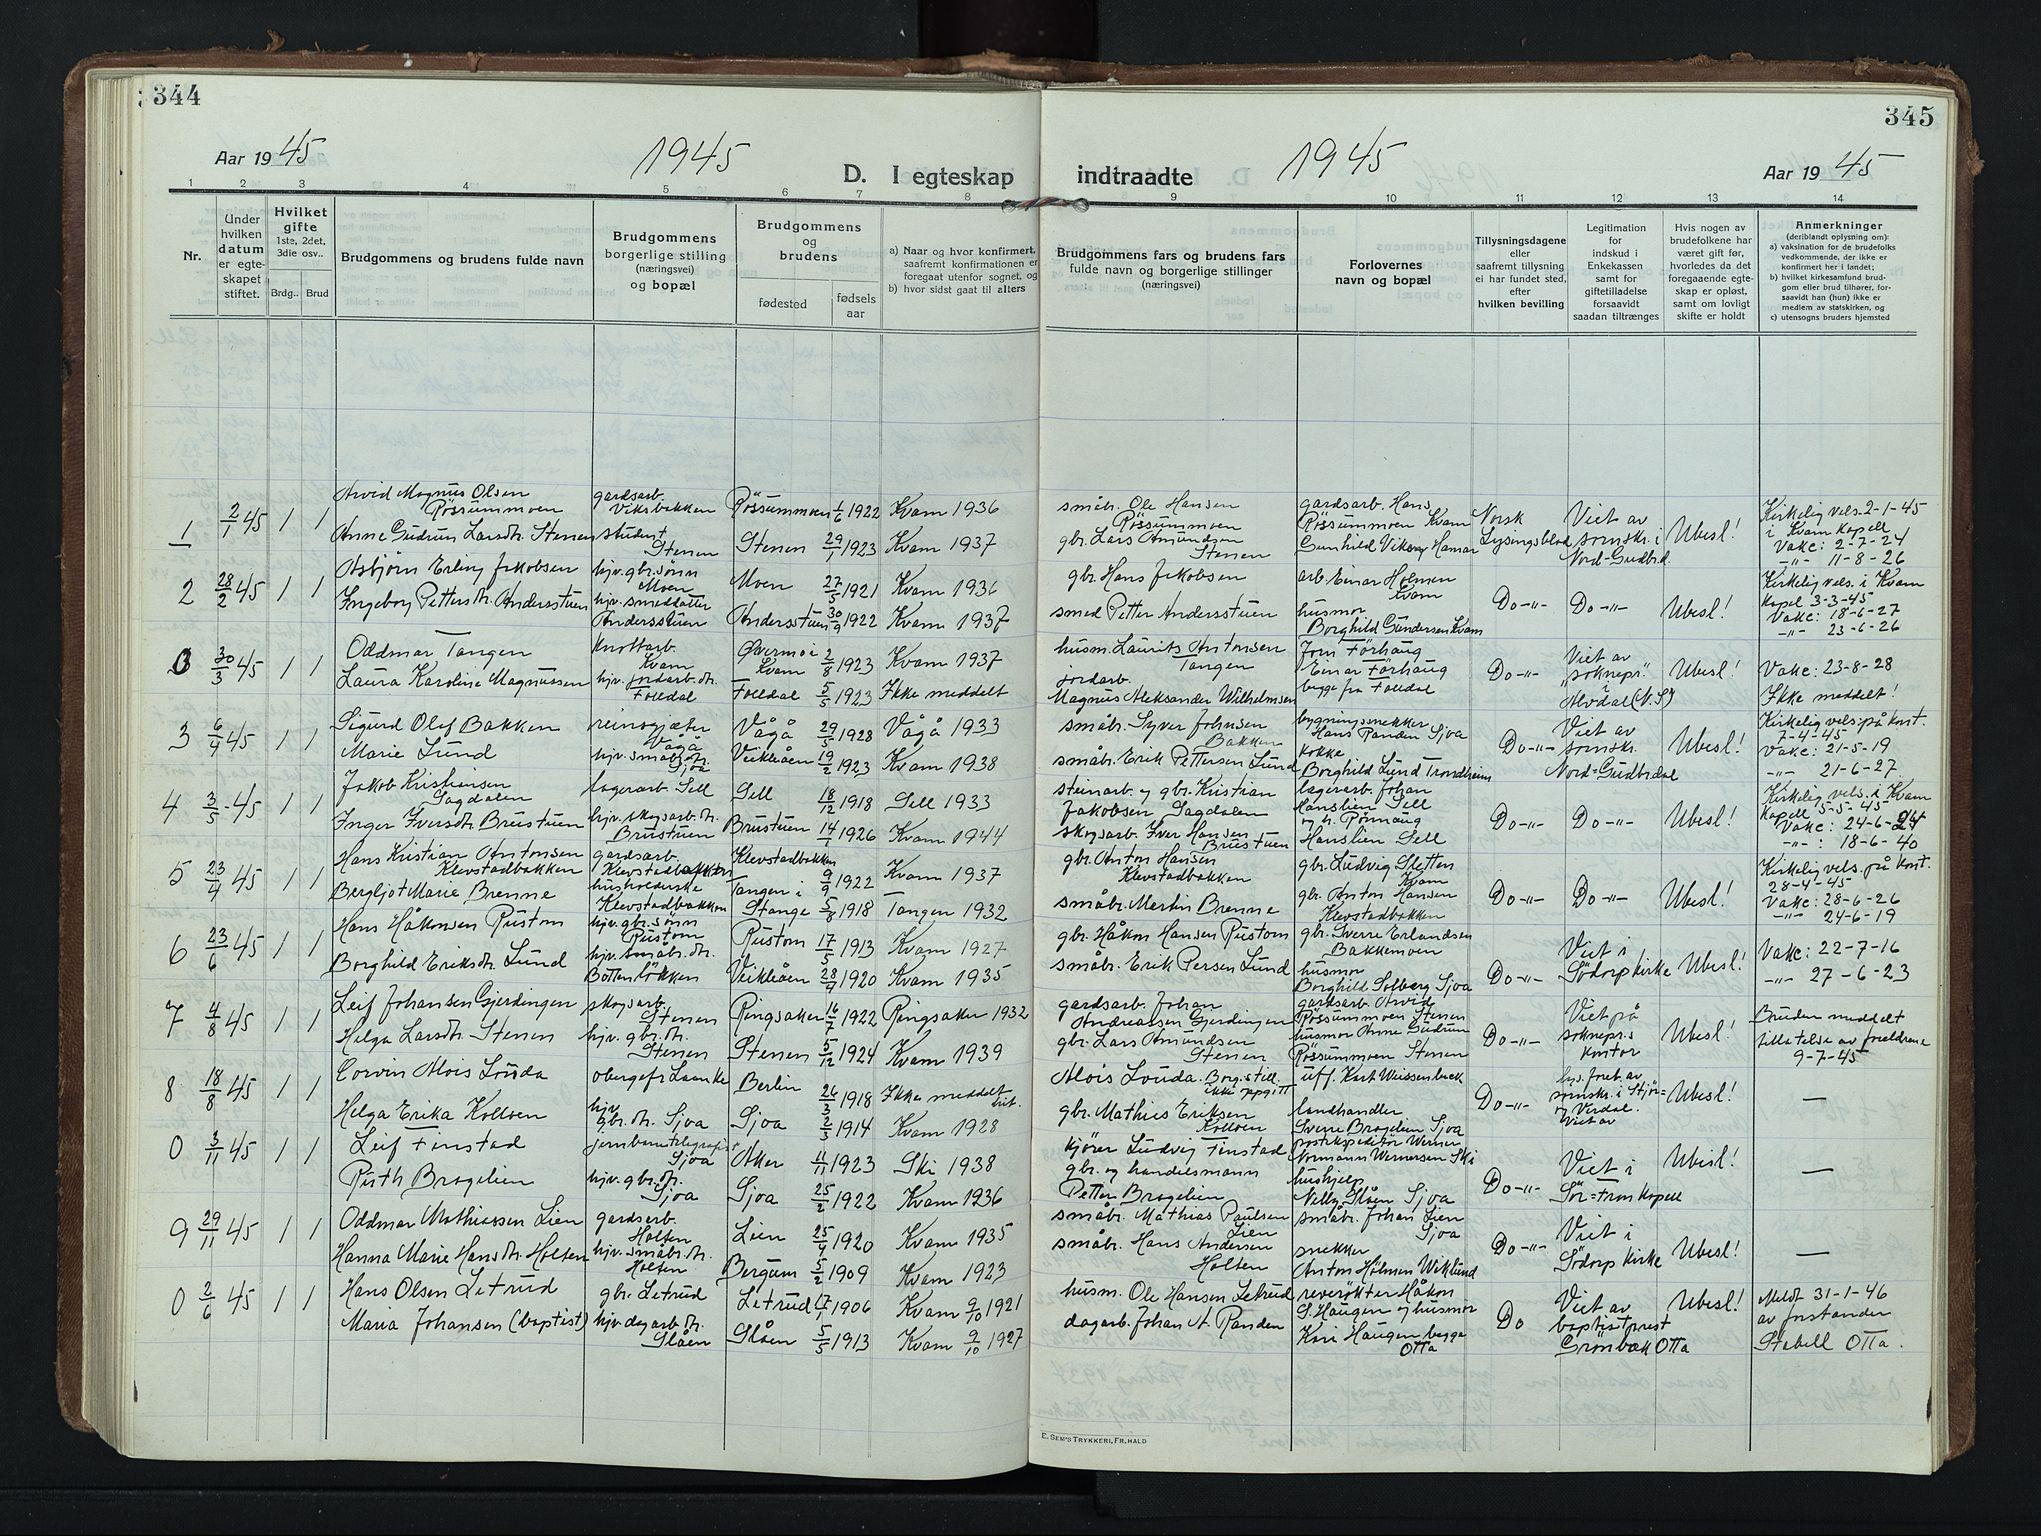 SAH, Nord-Fron prestekontor, Klokkerbok nr. 8, 1915-1948, s. 344-345